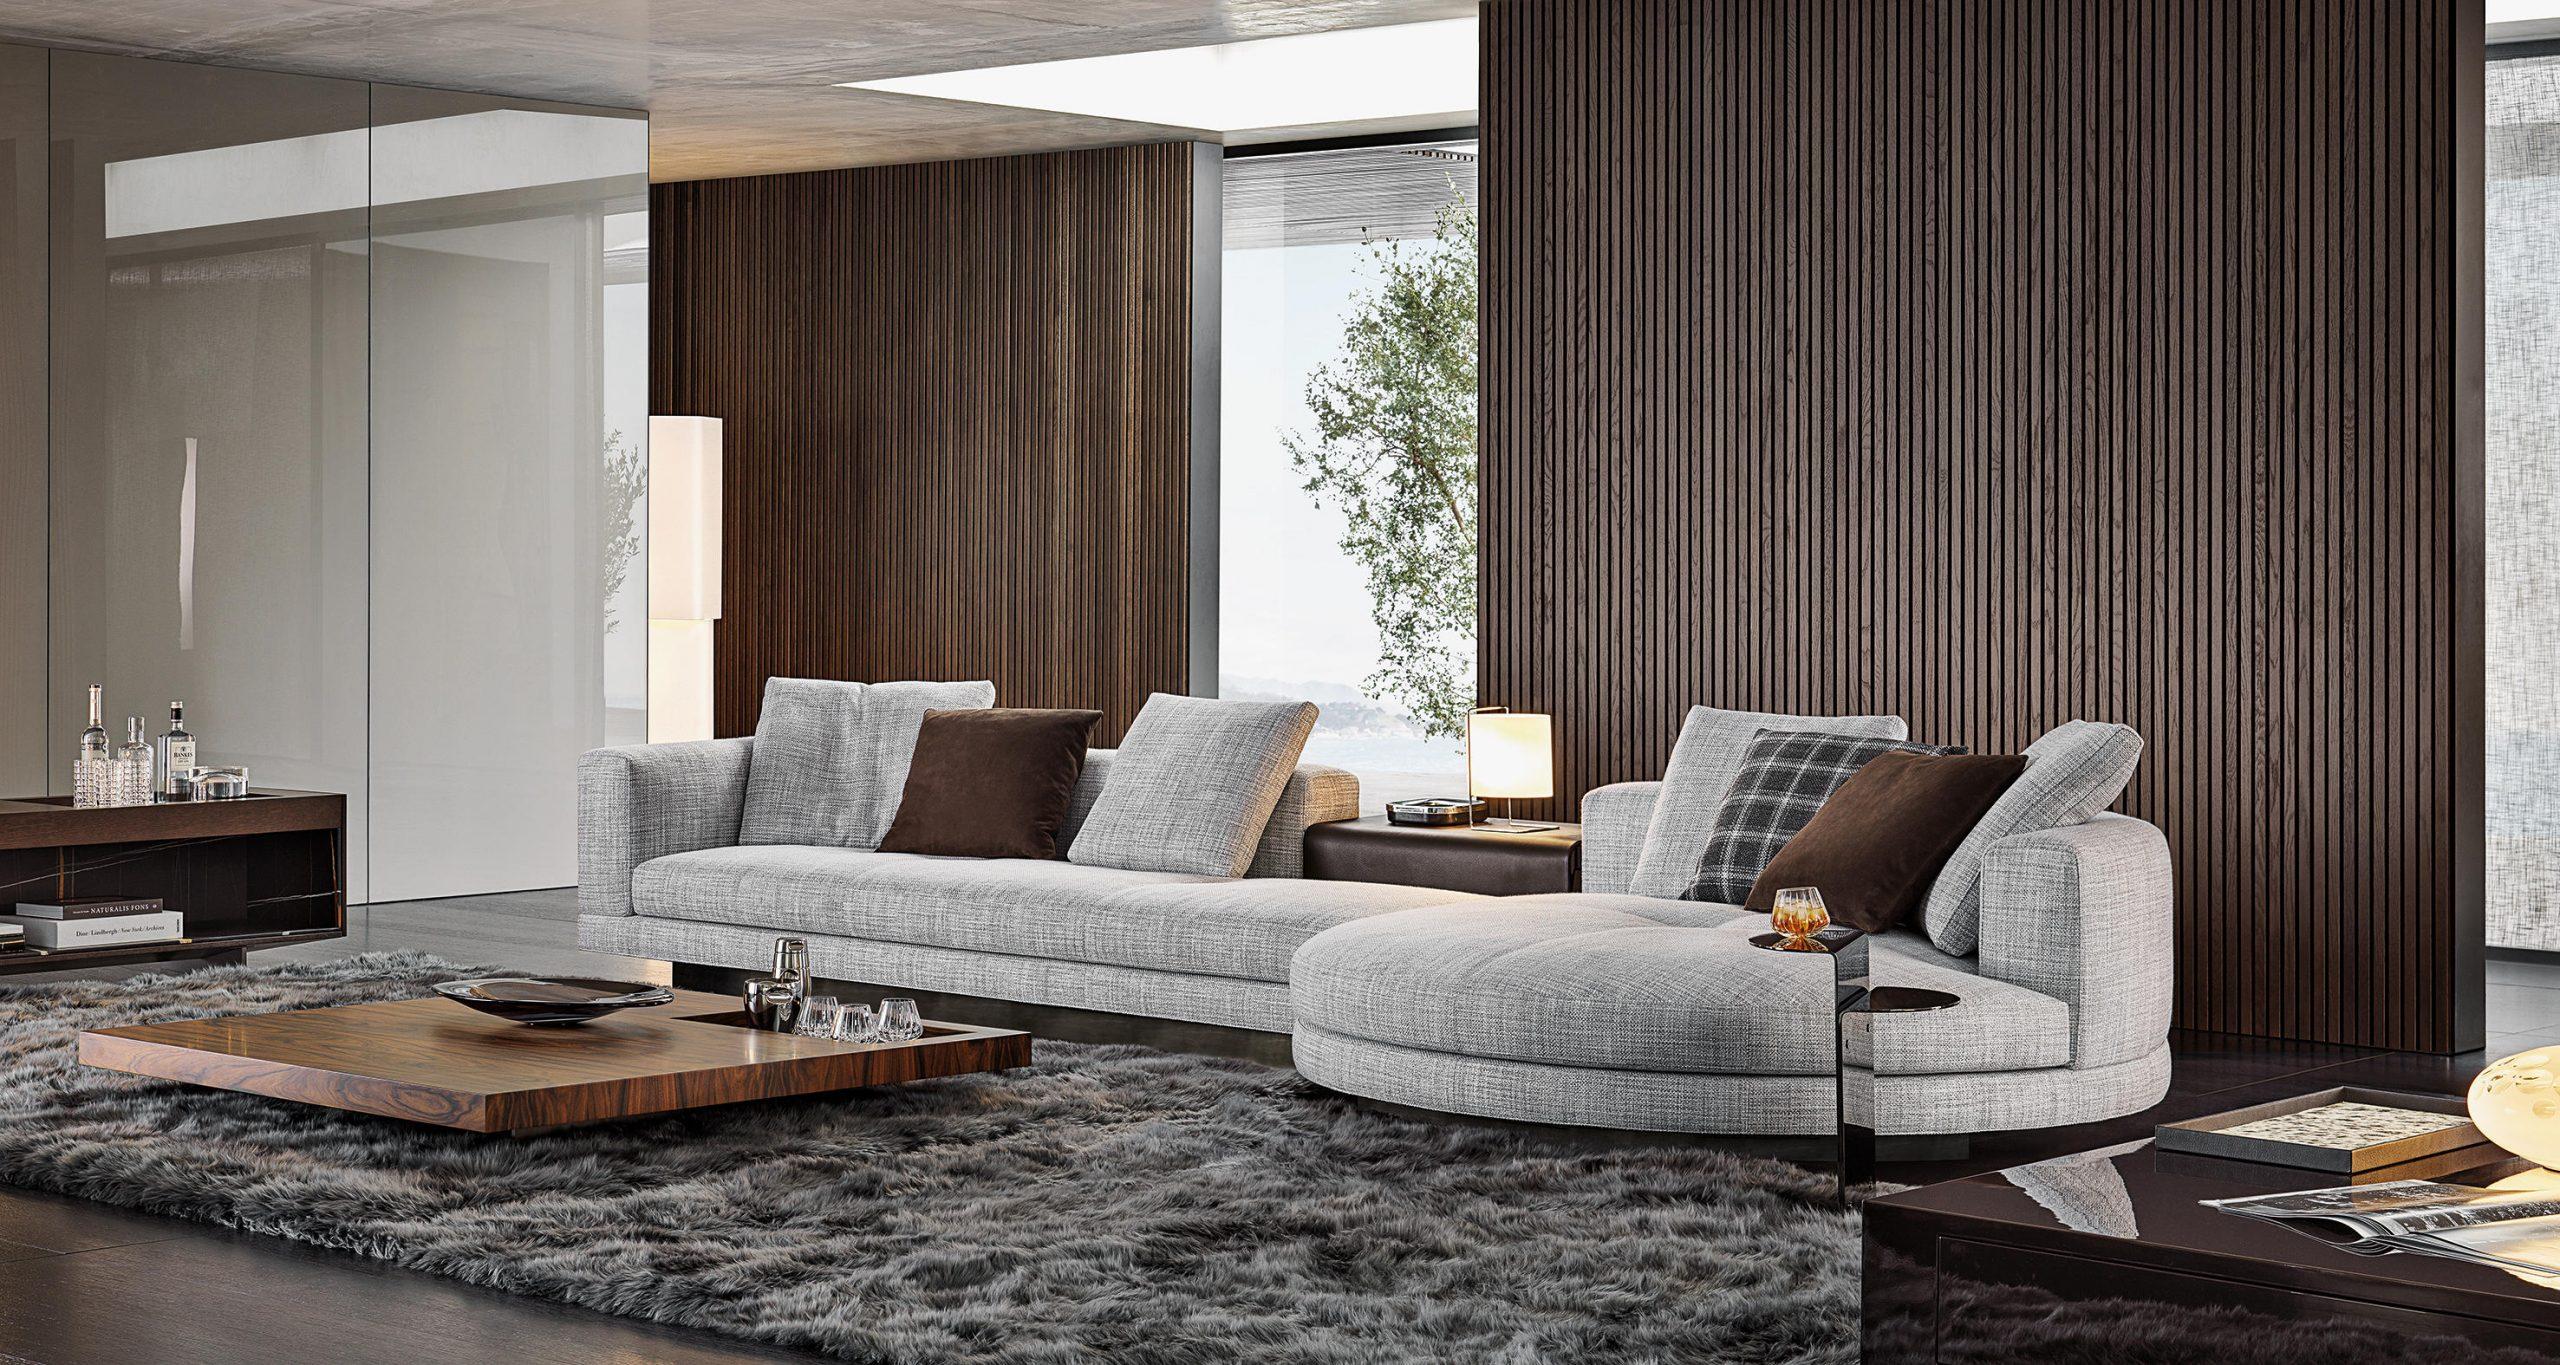 Connery Modular Sofa by Minotti